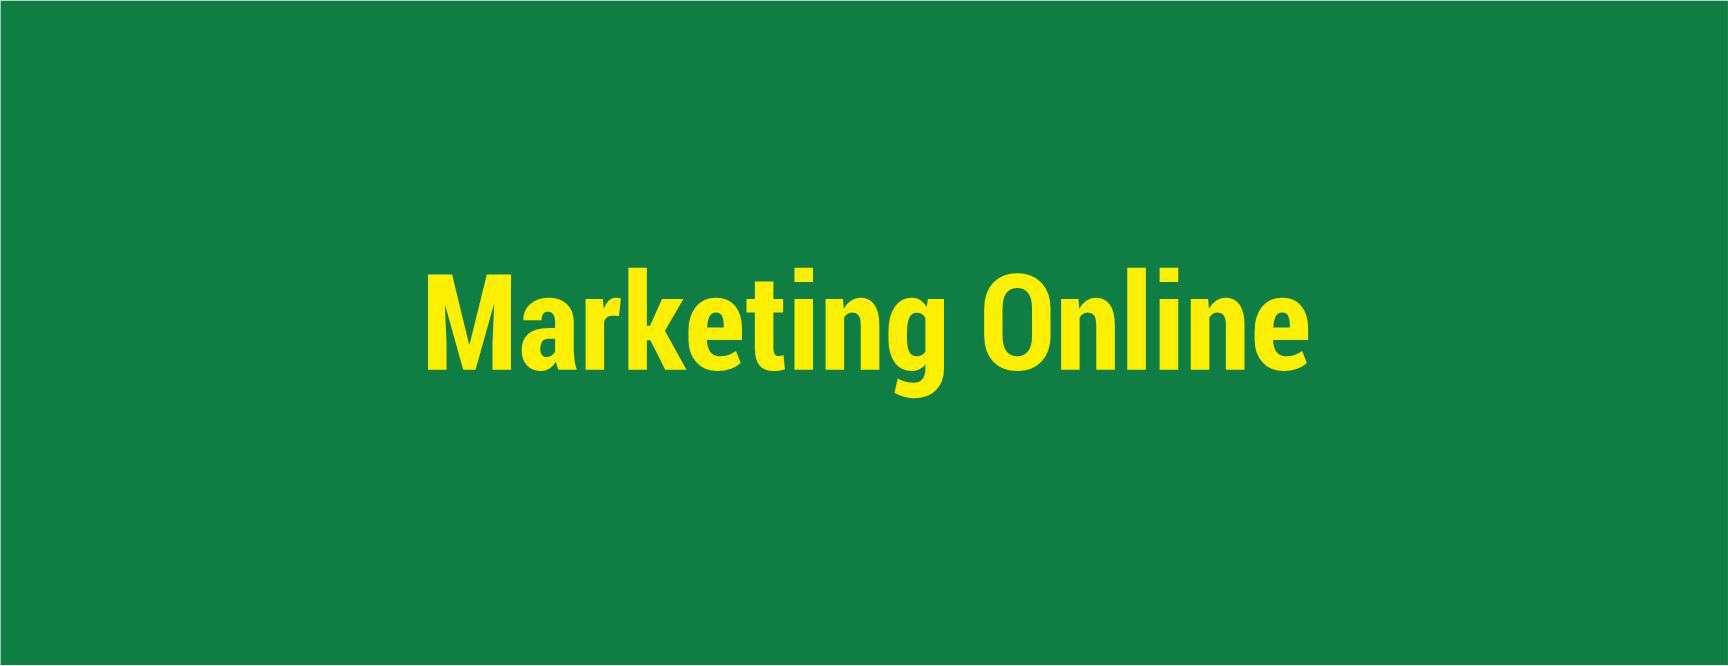 marketing online(FILEminimizer)